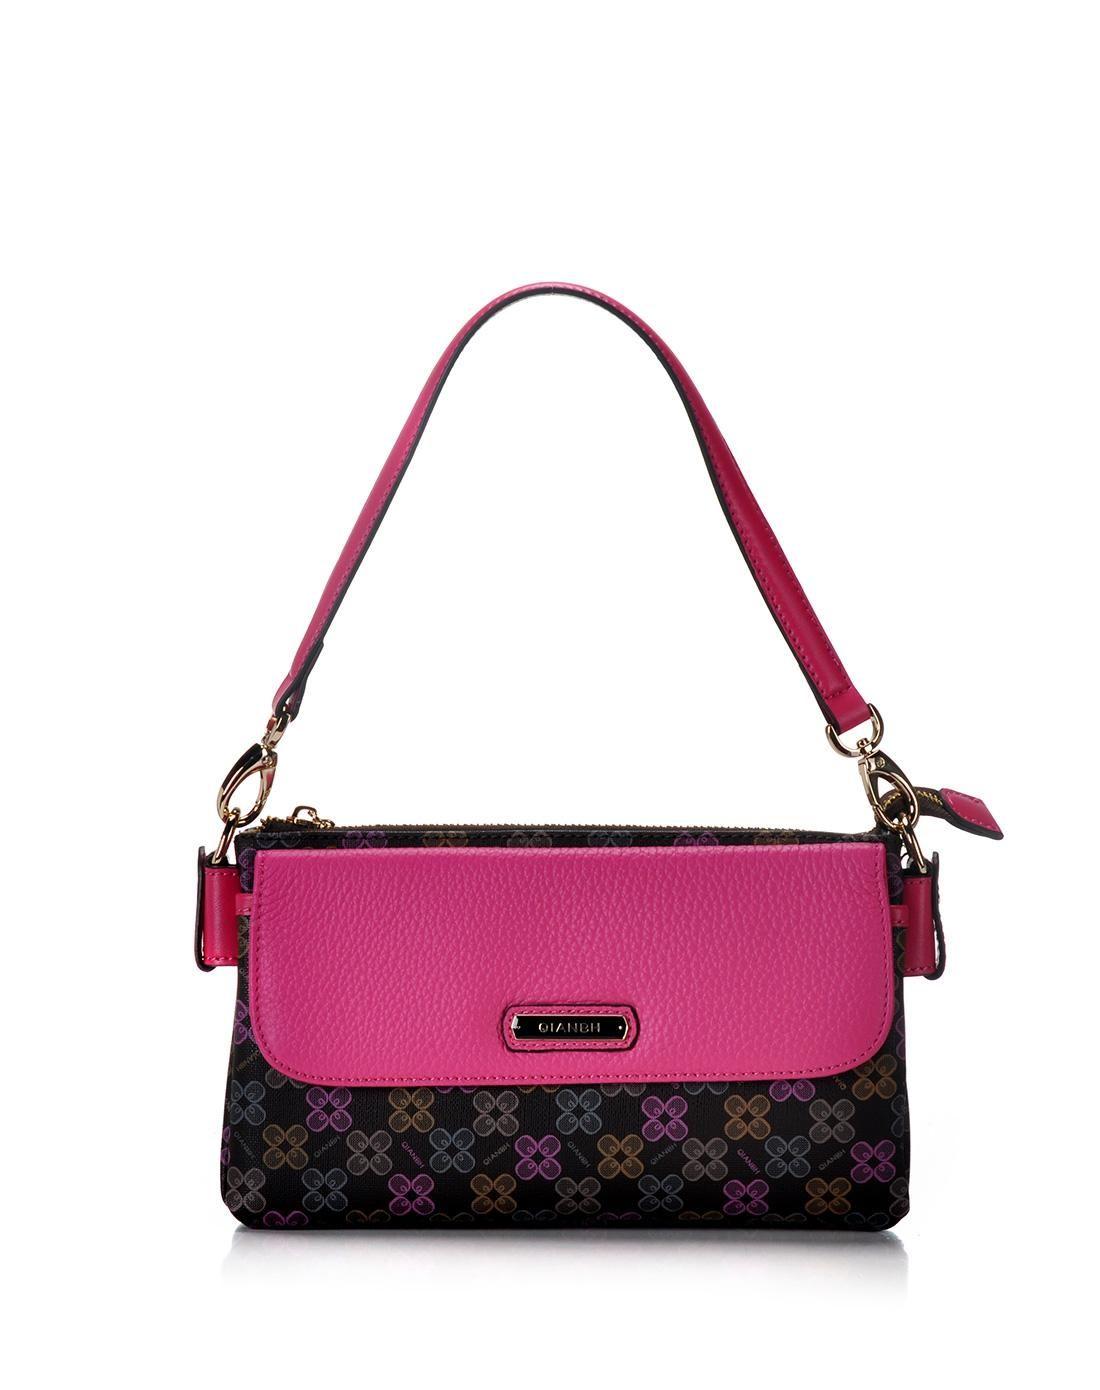 AdoreWe  VIPme (VIPSHOP Global) Accessories - QIANBH Coffee Brown and Pink  Floral Pattern Long Handbag - AdoreWe.com 4ef8c8f367707